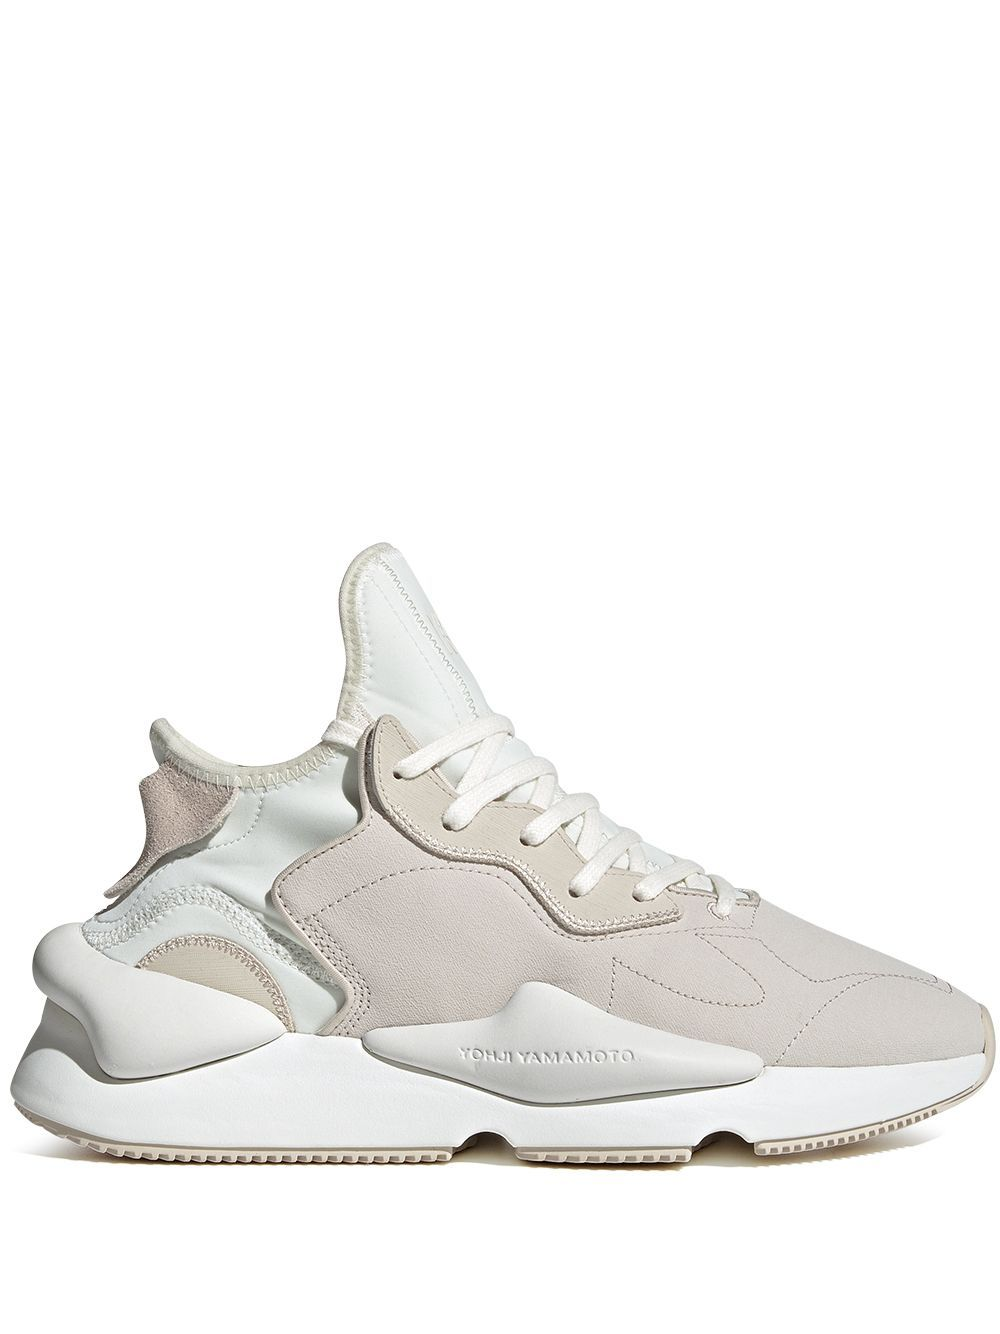 Y-3 sneakers white